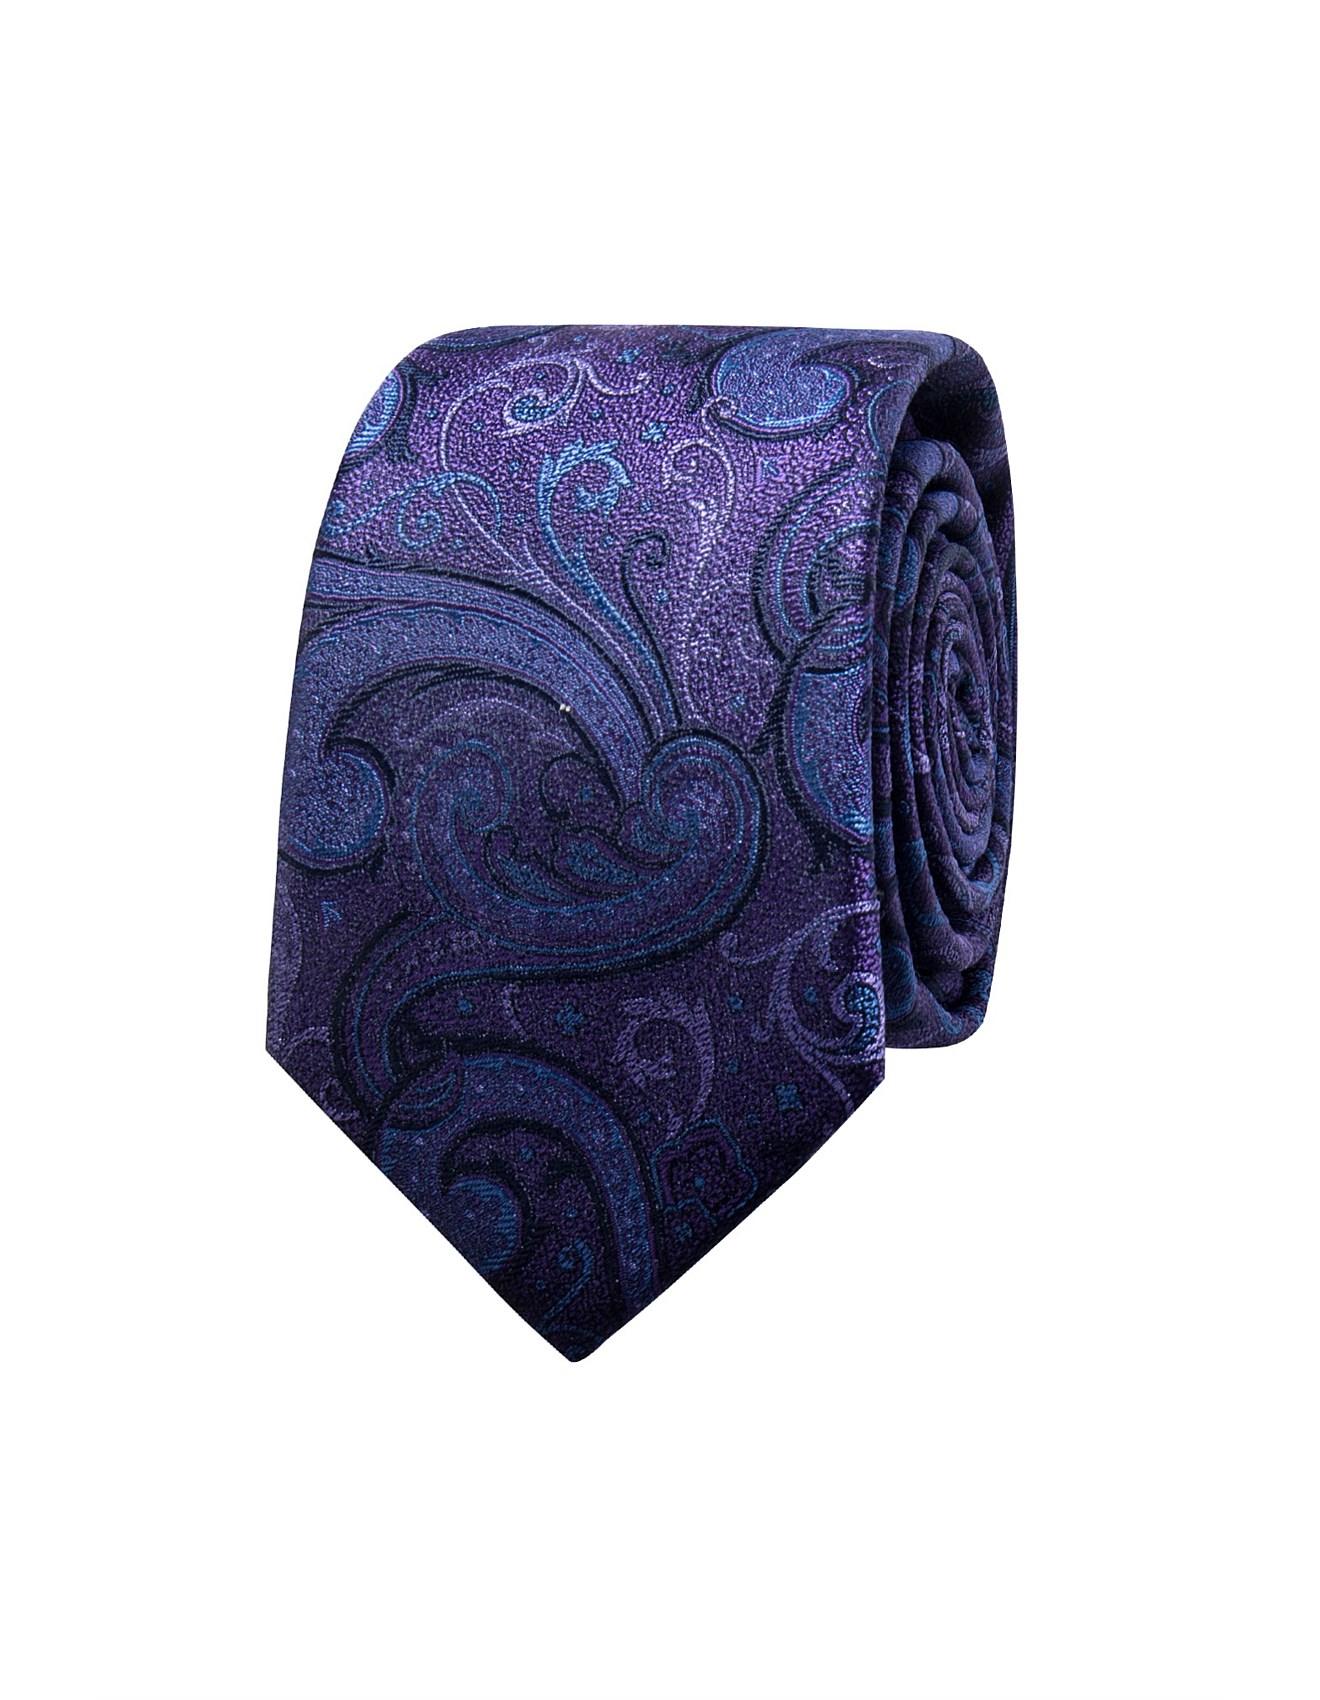 223bb215397e Men's Ties | Skinny Tie, Black Tie, Silk Tie & Knit Ties | David Jones -  LARGE PAISLEY TIE